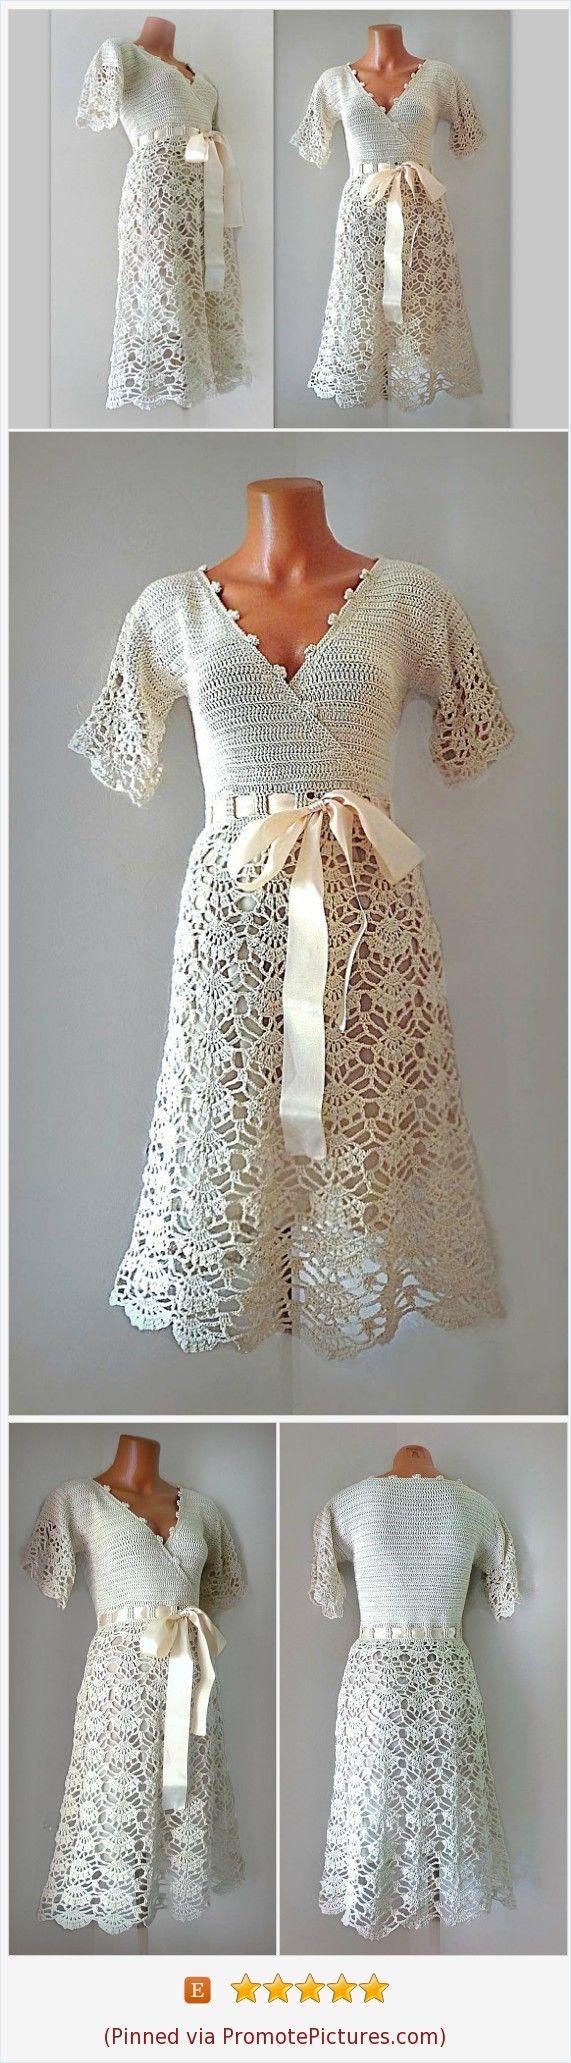 Simple bridal dress with short sleeves midi wrap lace dress boho